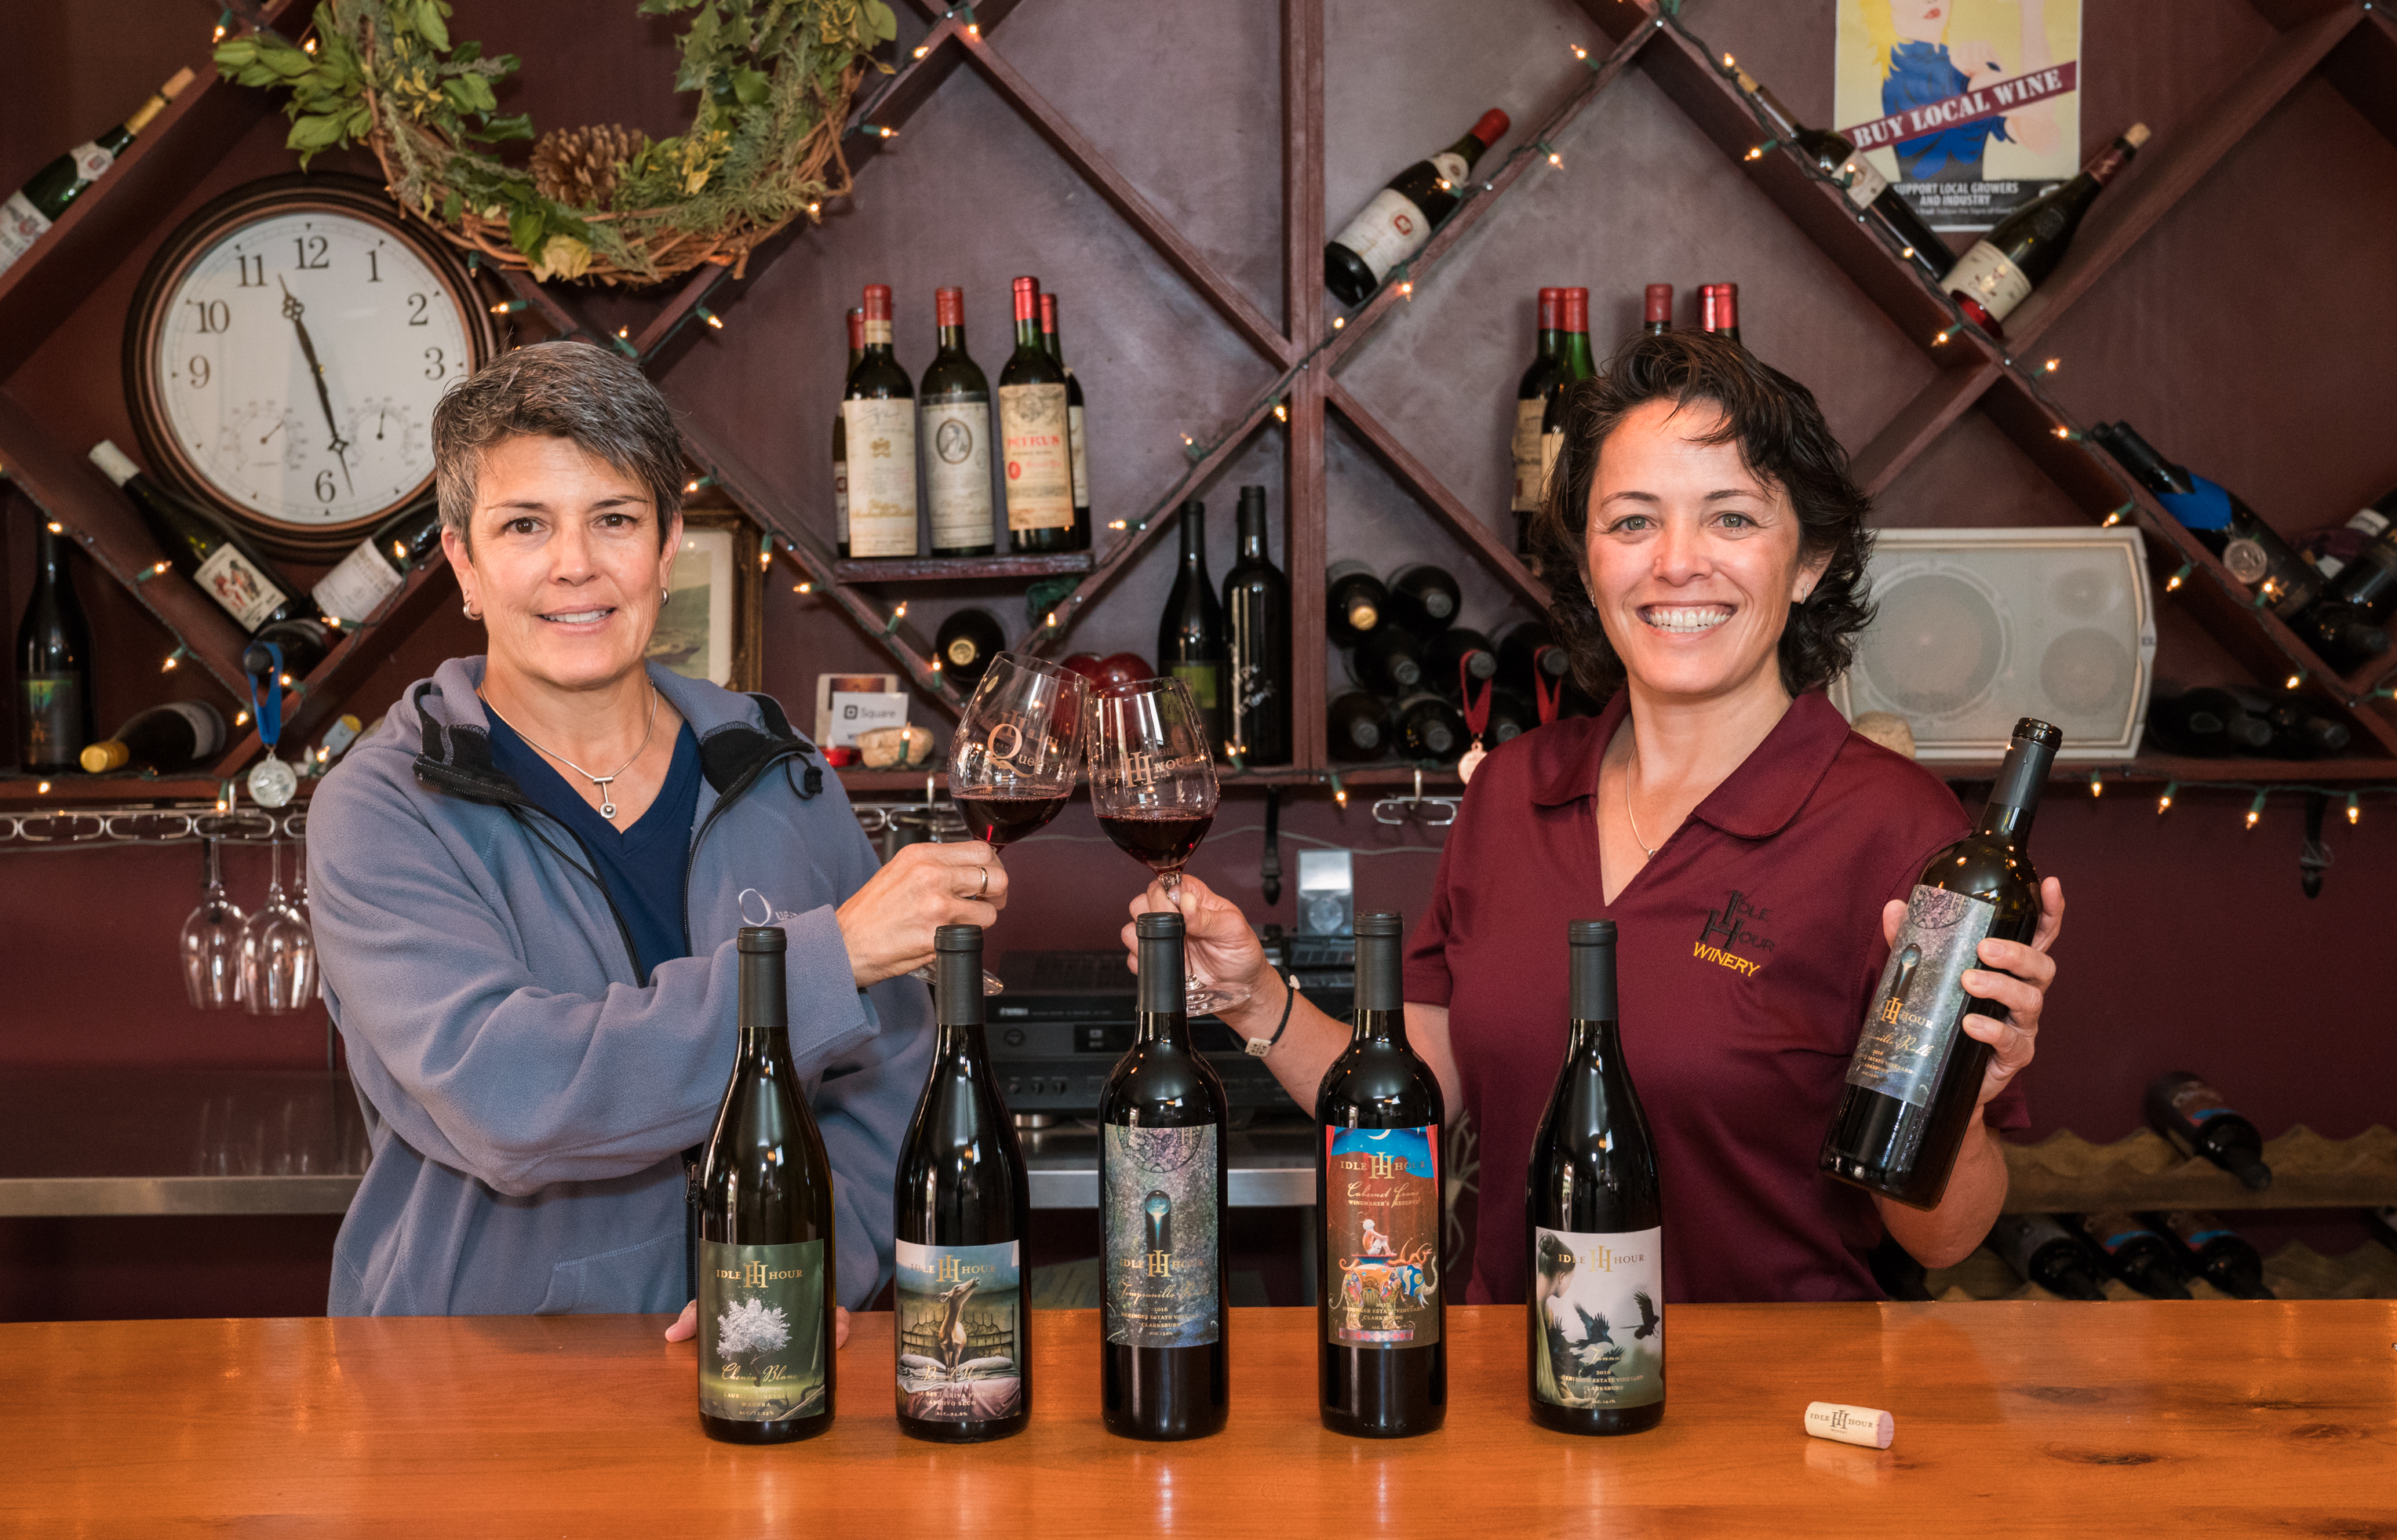 Idle Hour Winery Oakhurst CA